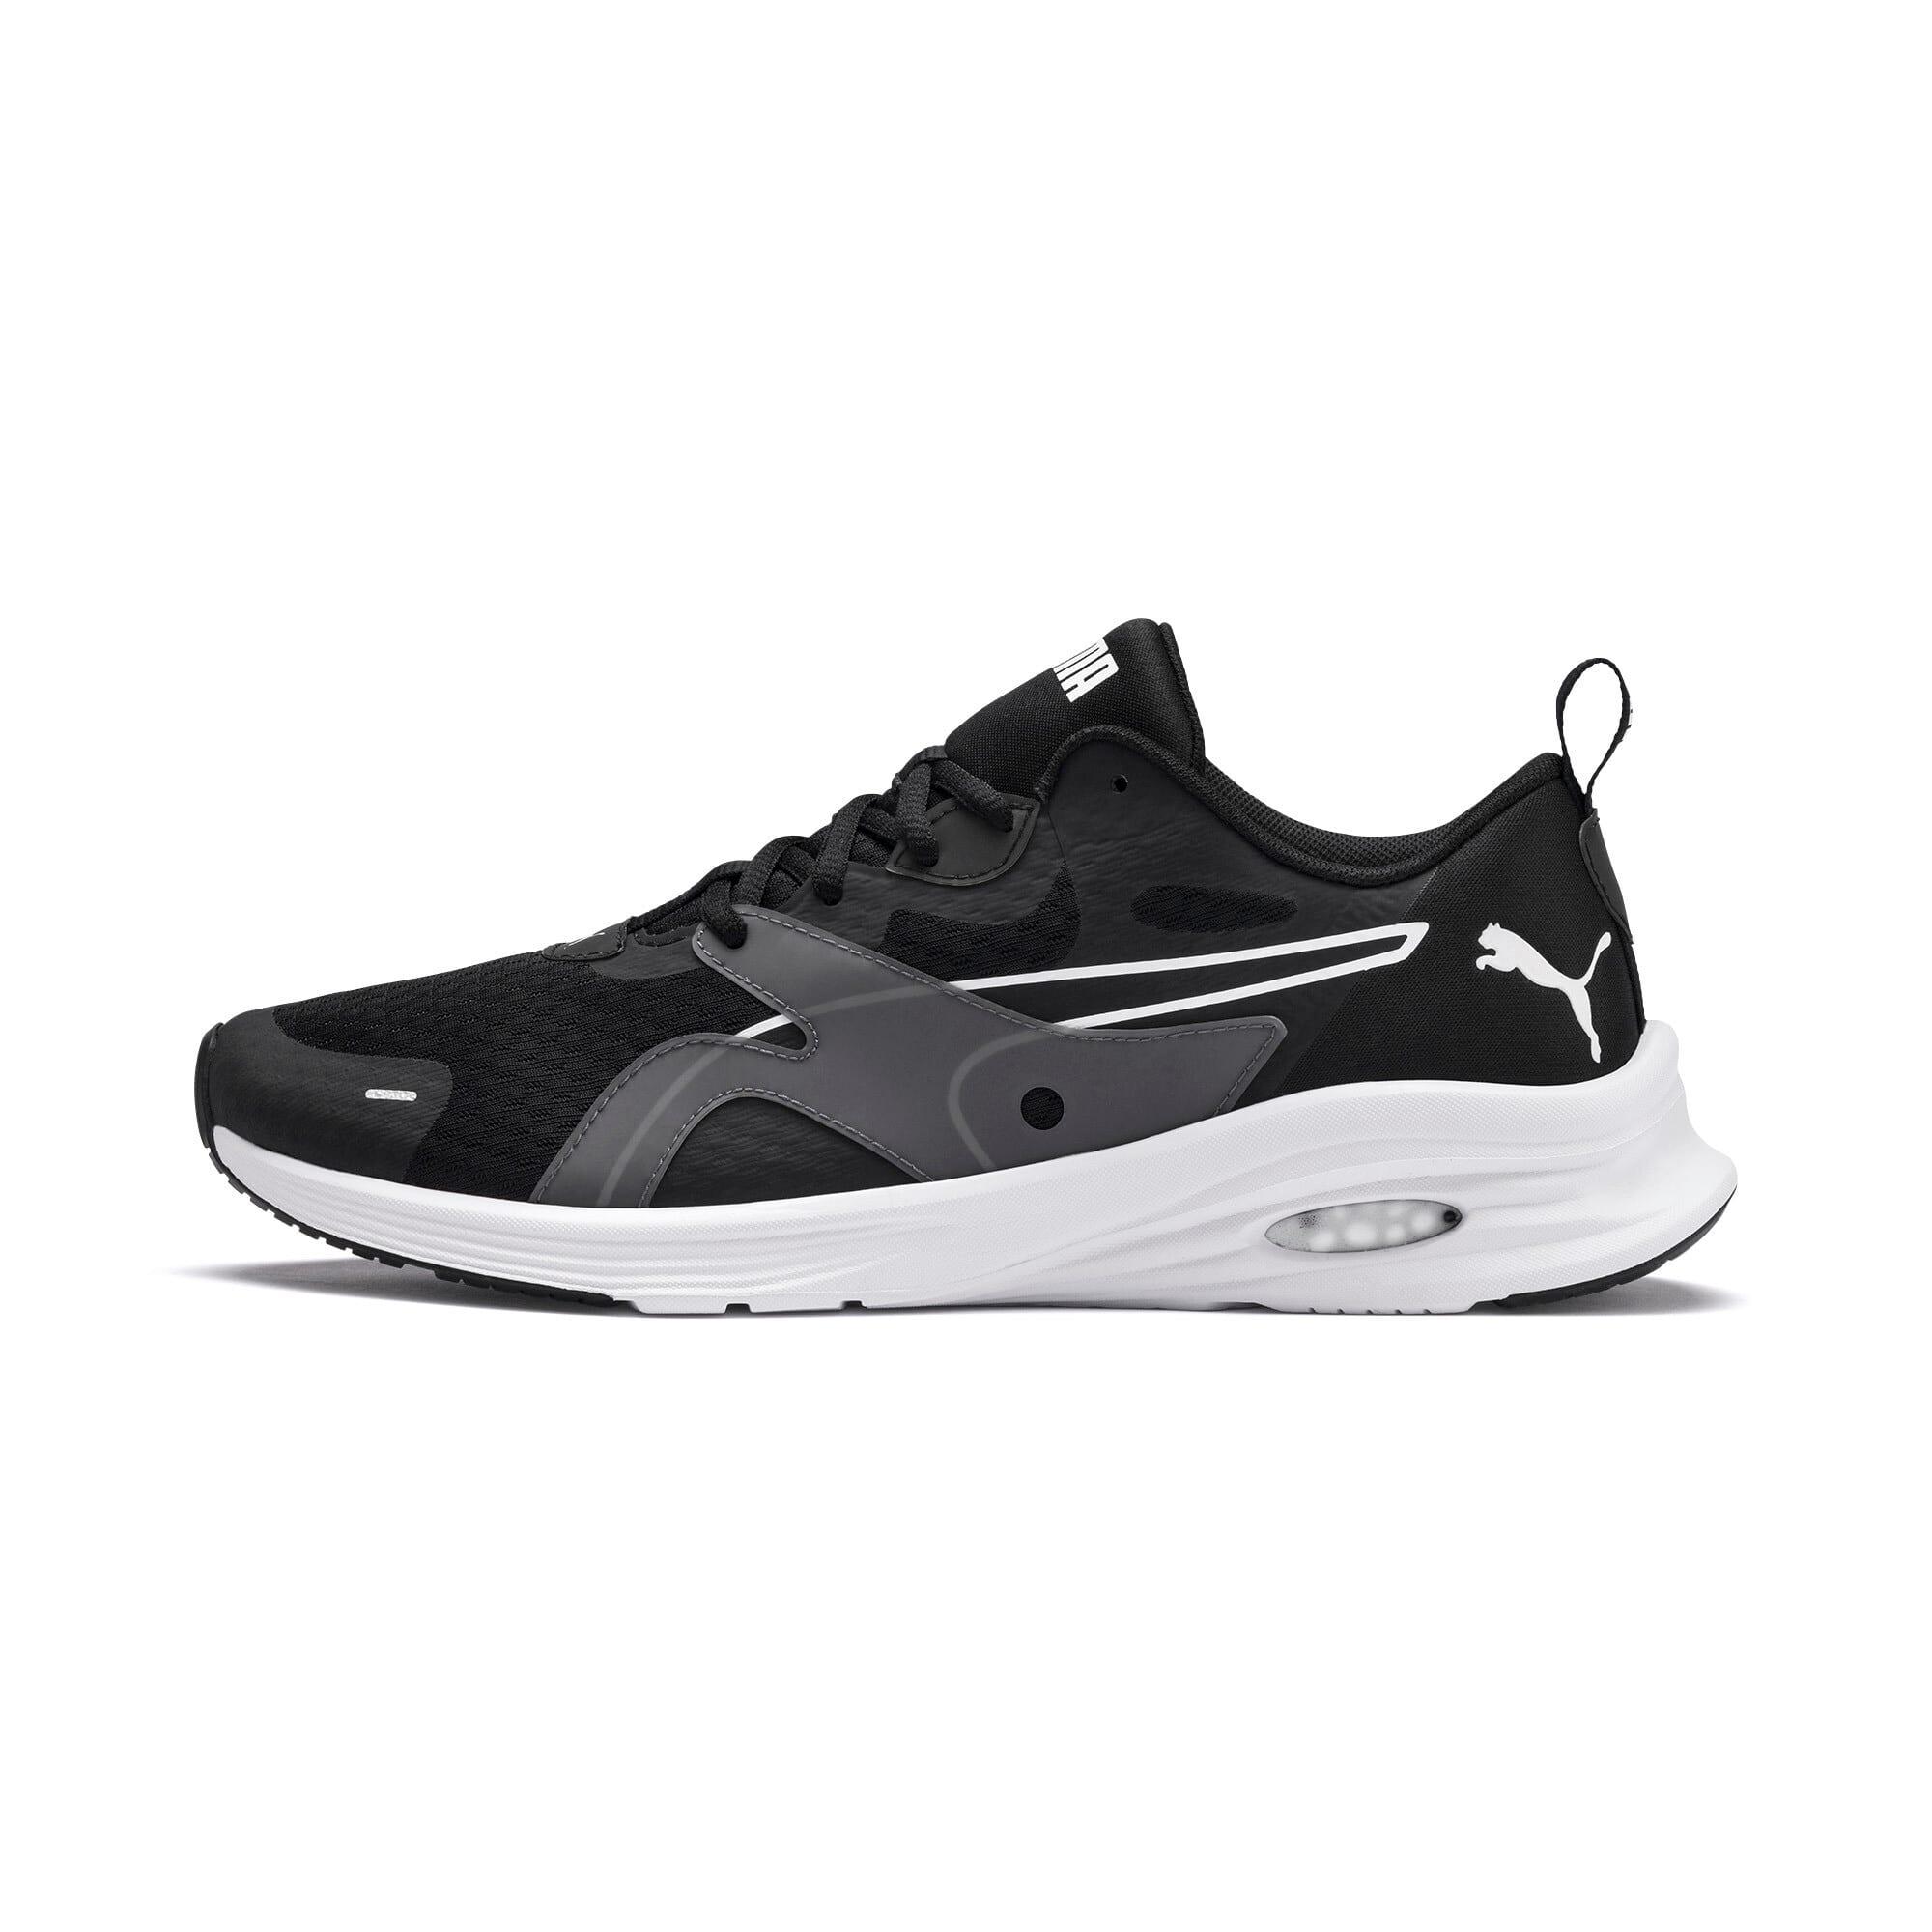 Thumbnail 1 of HYBRID Fuego Men's Running Shoes, Puma Black-Puma White, medium